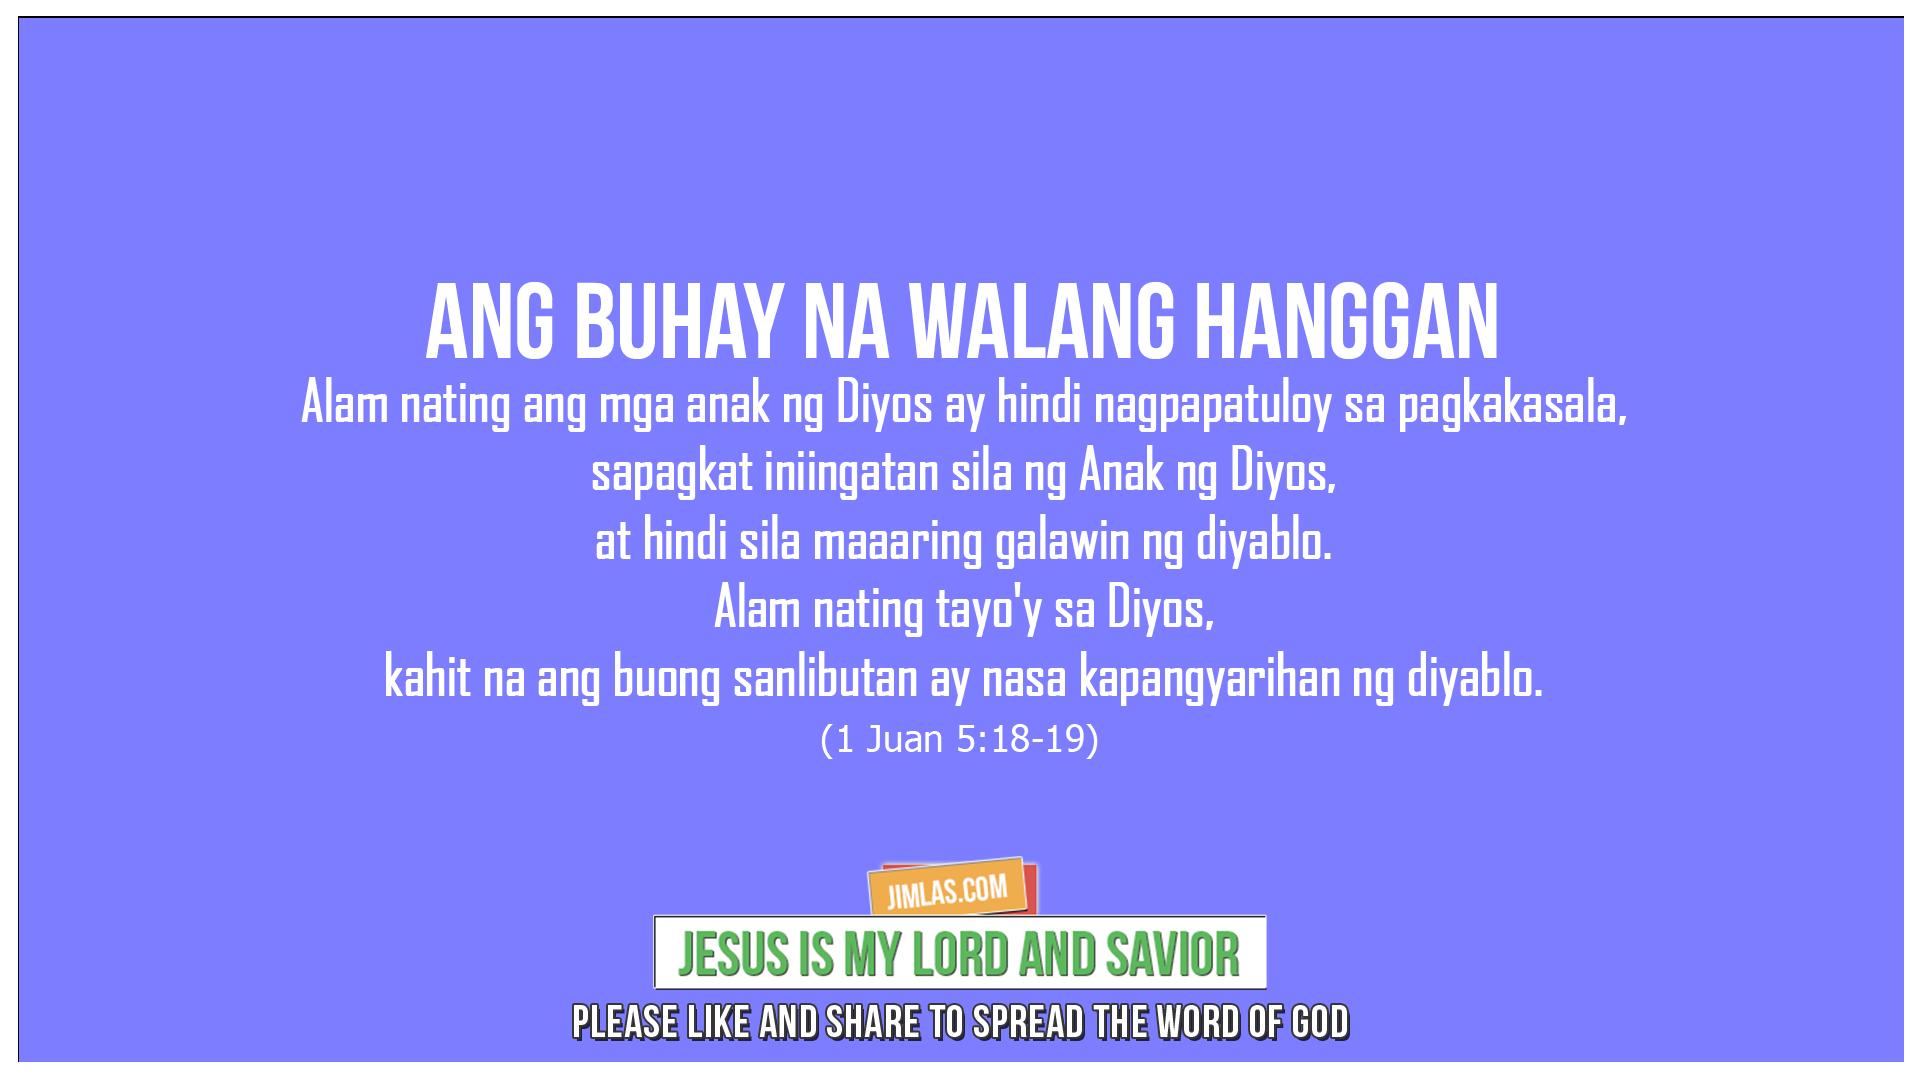 1 Juan 5:18-19, 1 Juan 5:18-19